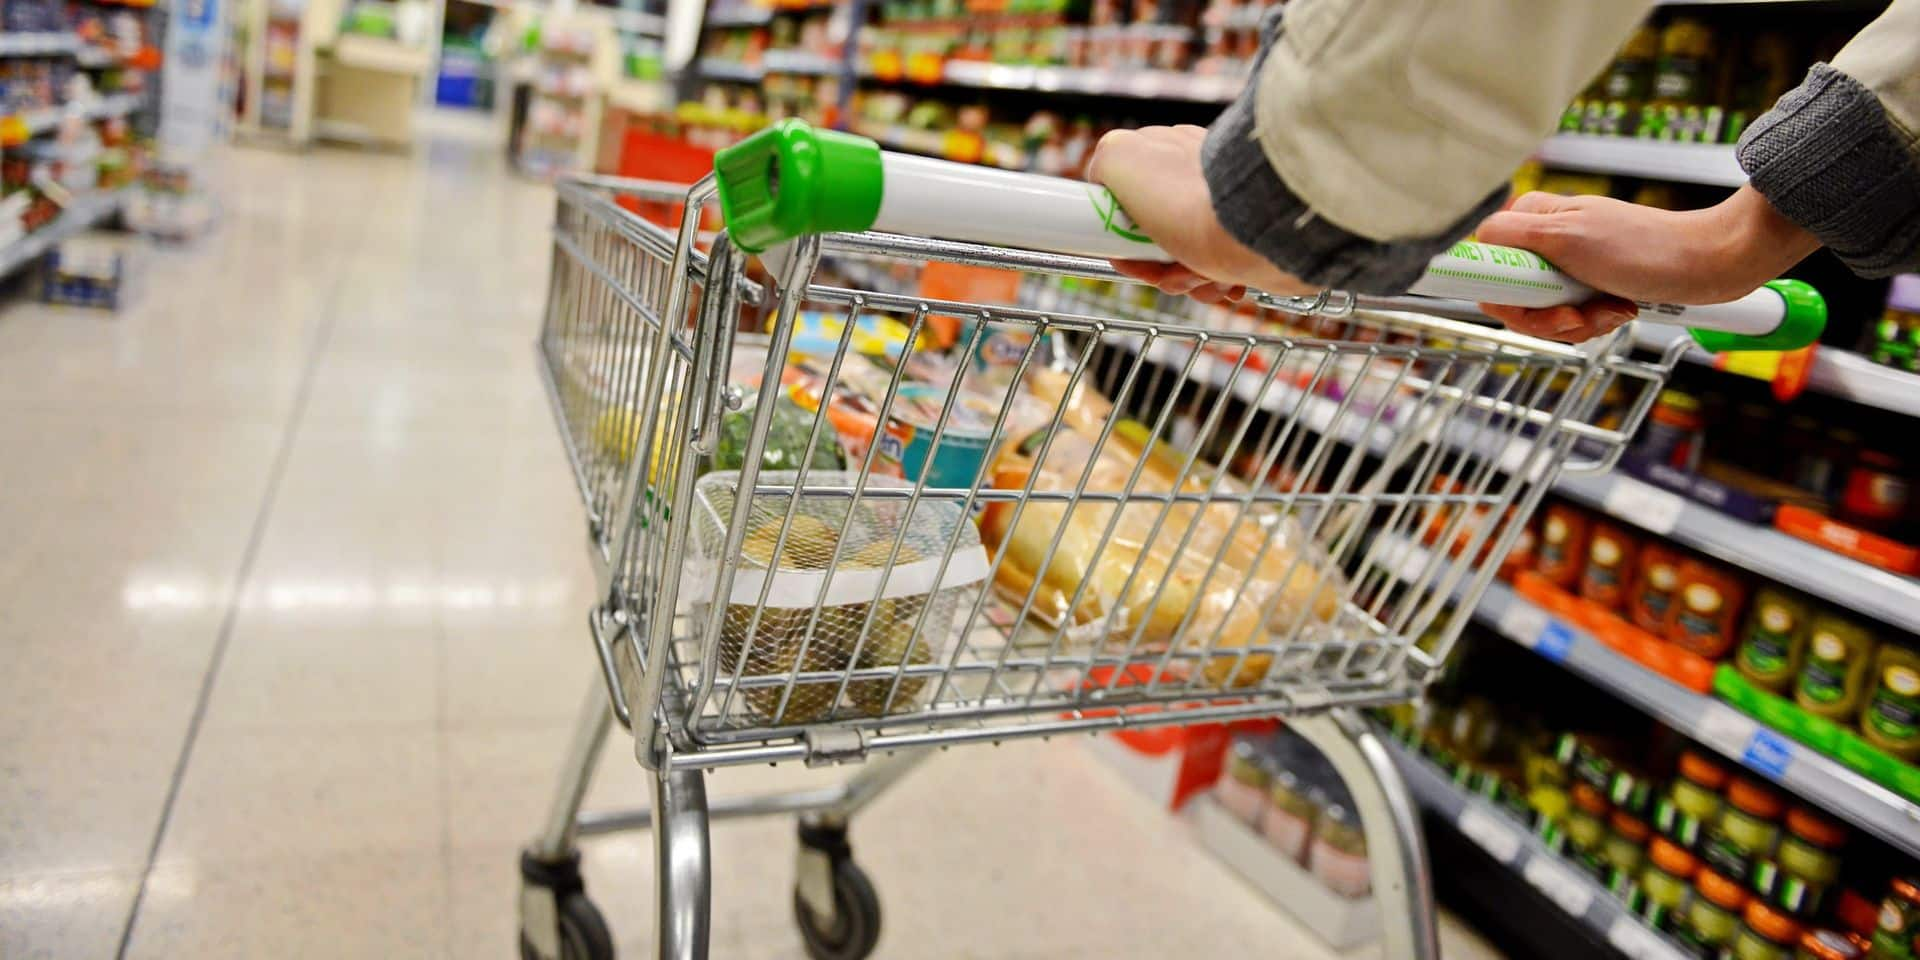 A,Shopper,Pushes,A,Trolley,Along,A,Supermarket,Aisle,-